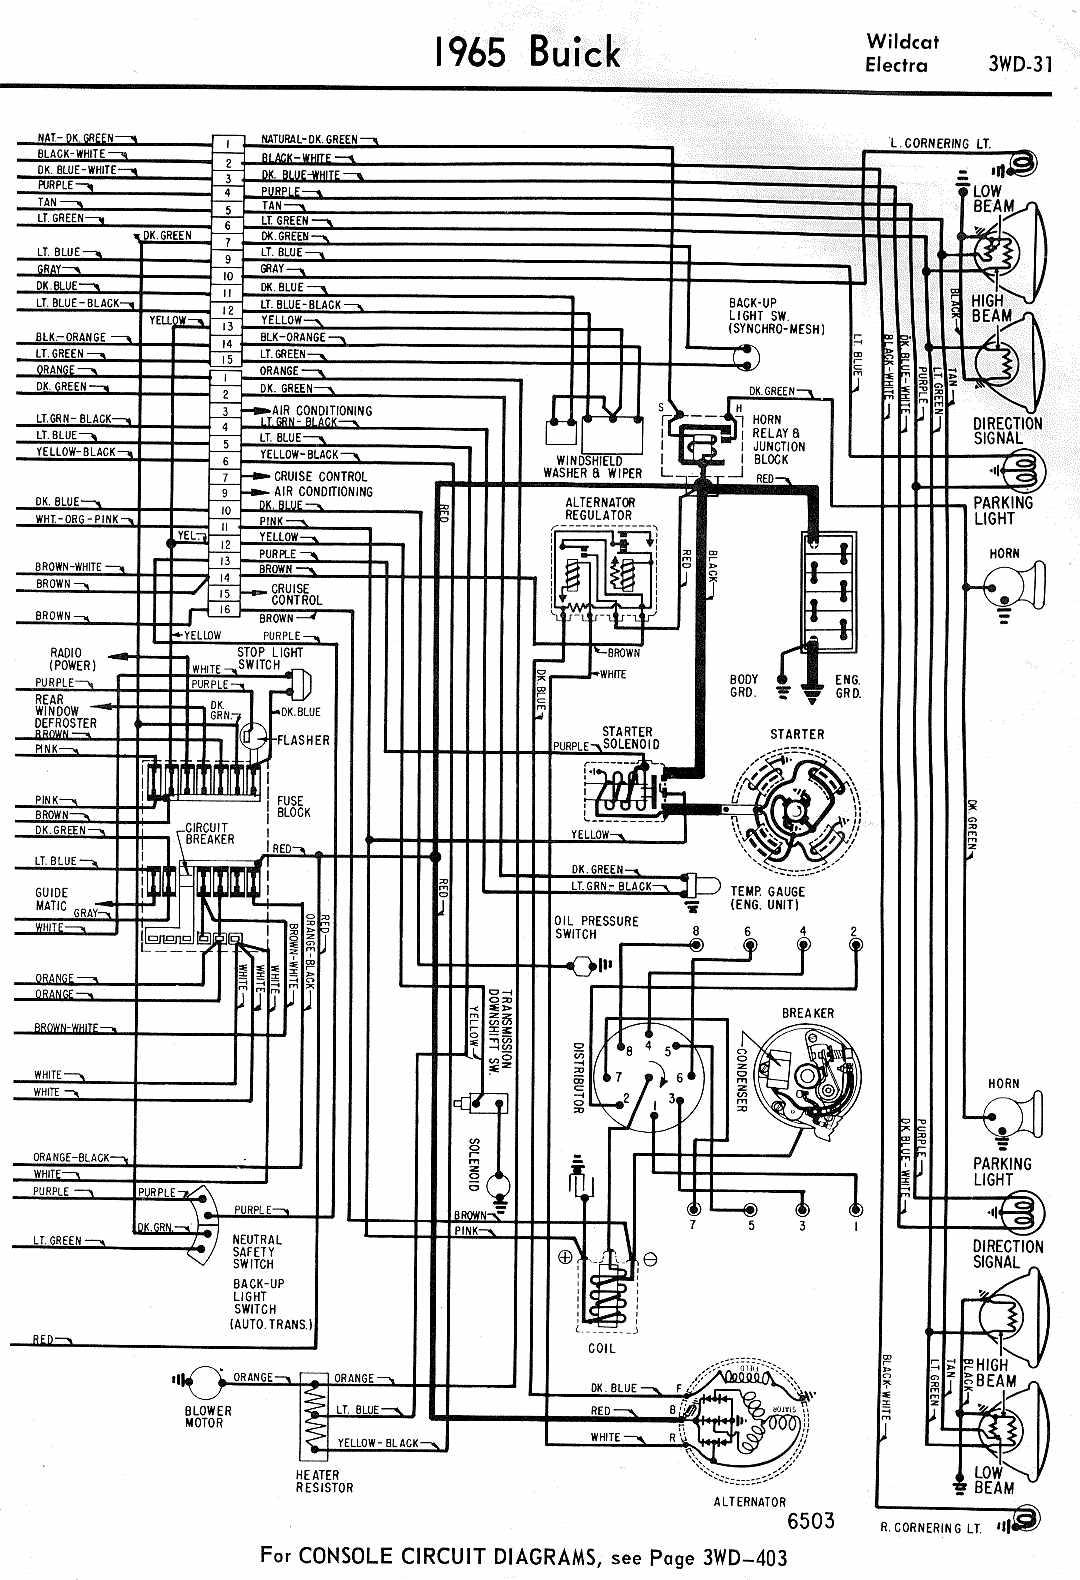 Fantastic 1978 Buick Wiring Diagram Wiring Diagram Database Wiring Digital Resources Xeirawoestevosnl